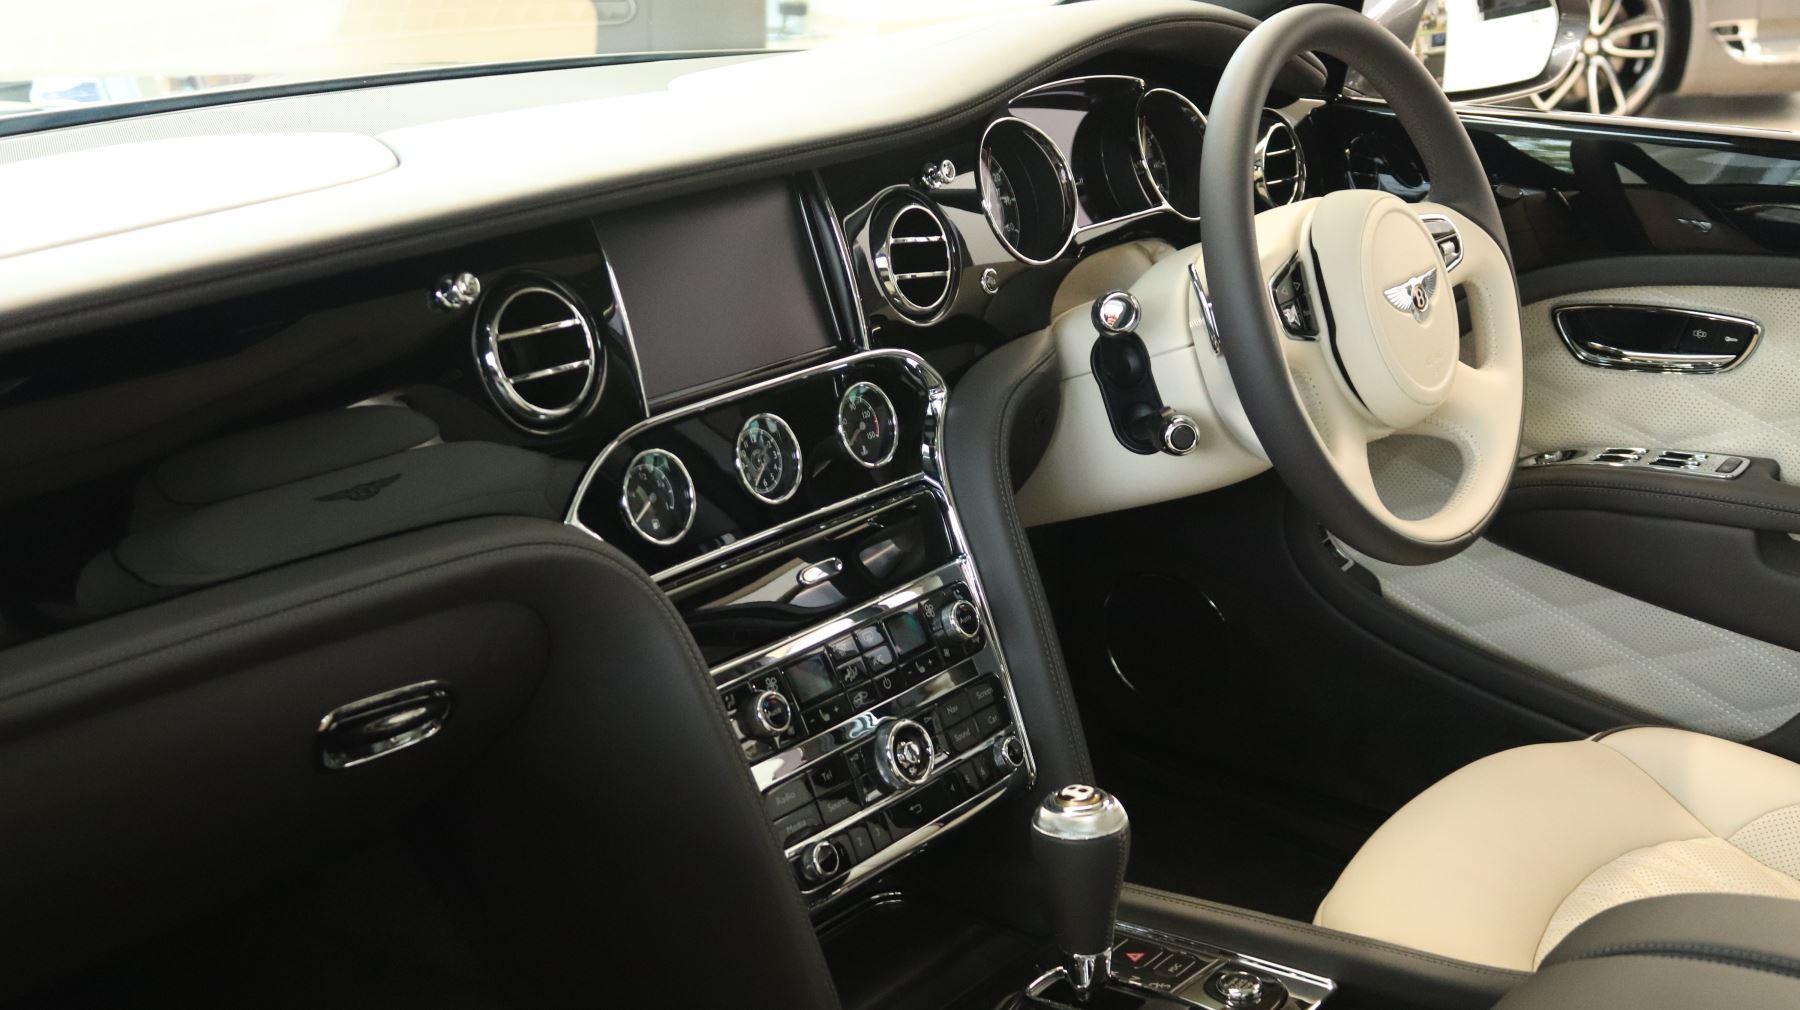 Bentley Mulsanne Speed 6.8 V8 Speed Auto image 3